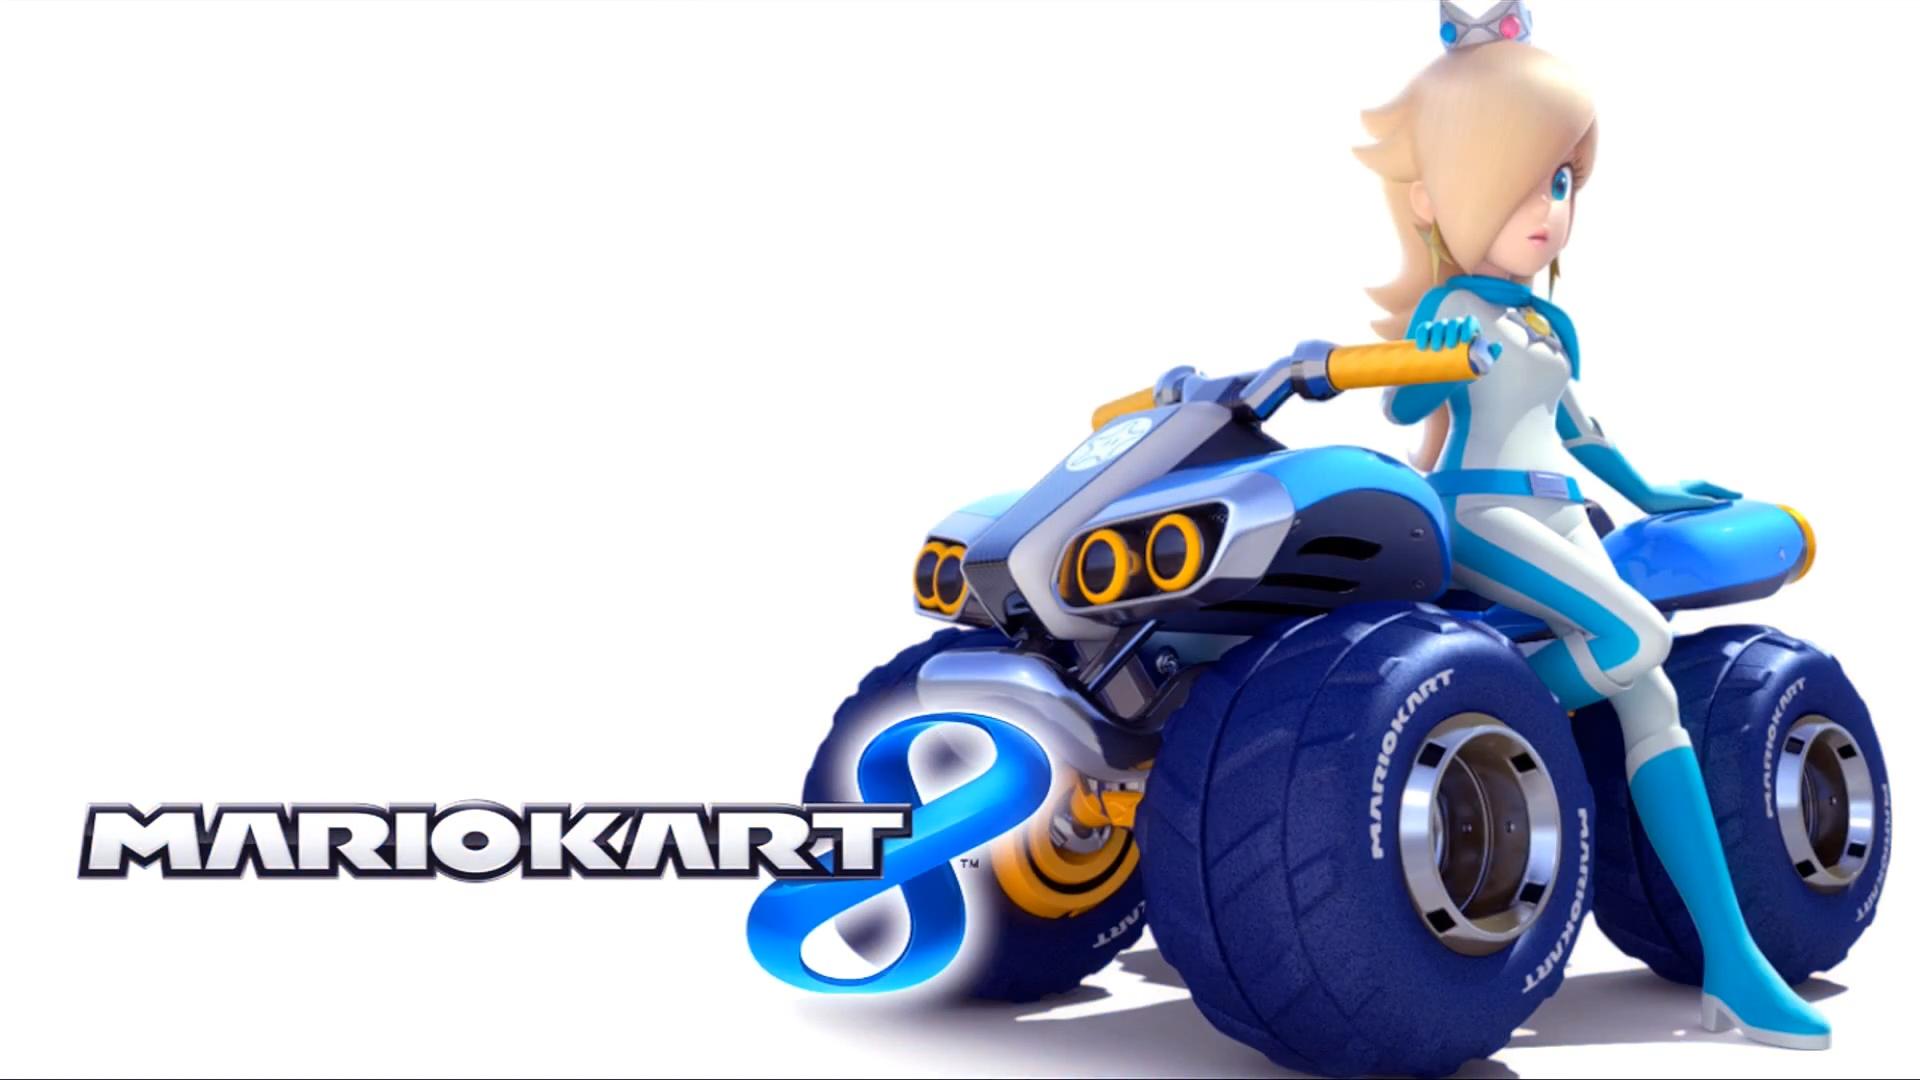 Mario Kart 8 Title Screen Rosalina Png Mario Kart 8 Mario Kart Mario Kart Wii